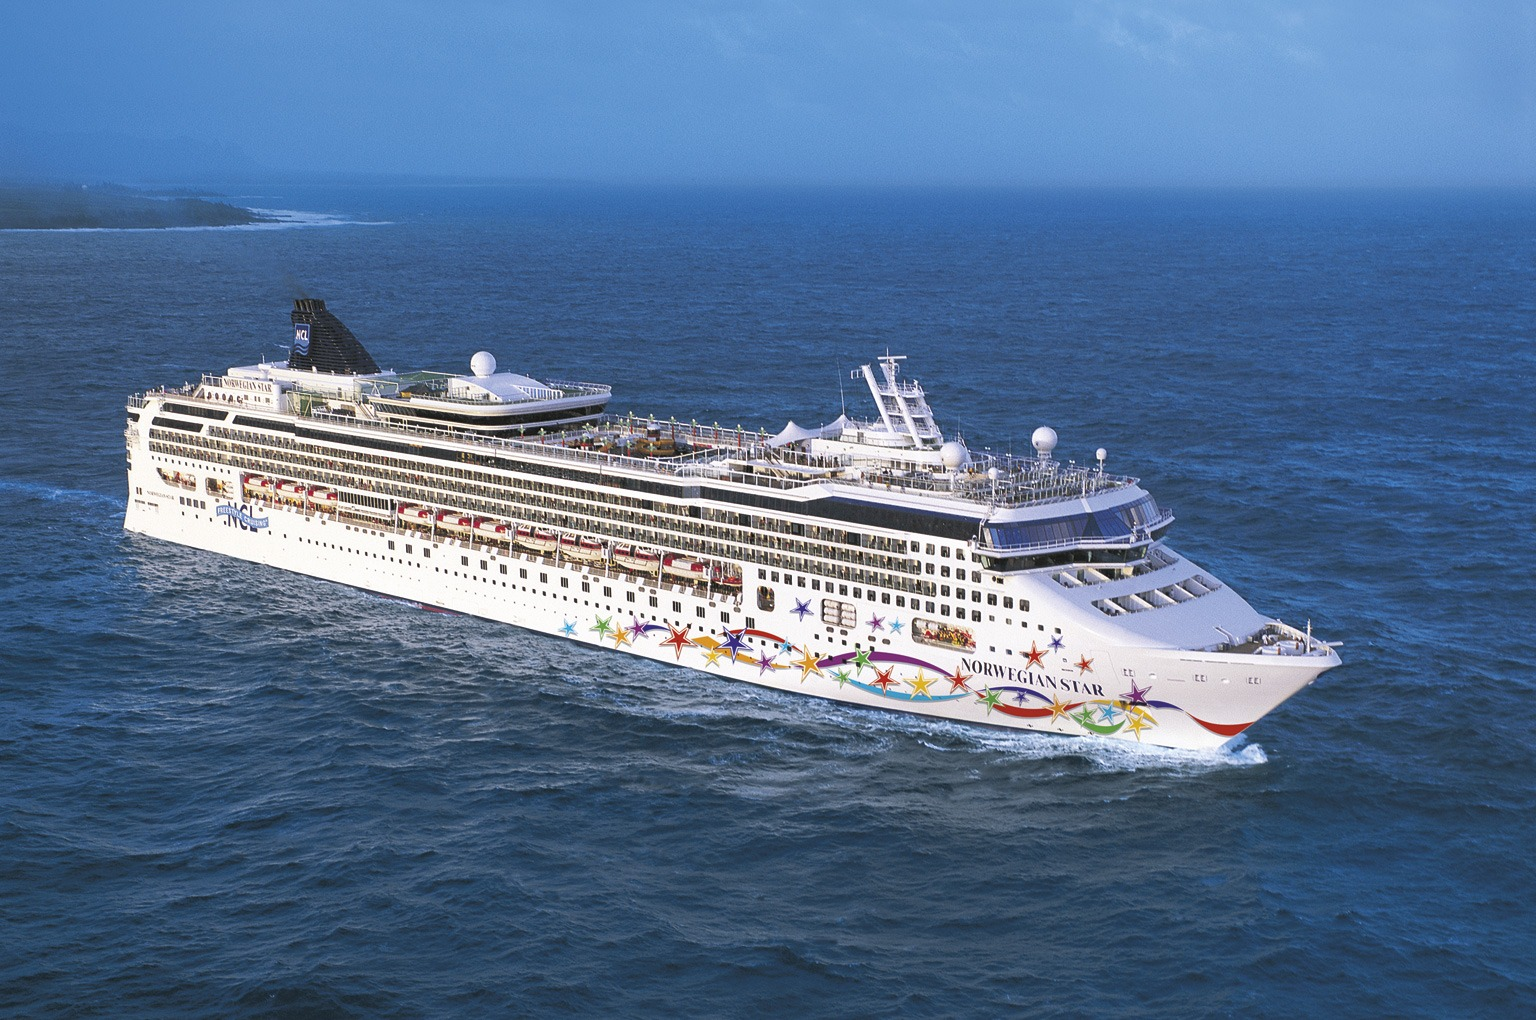 MS Norwegian Star Norwegian Cruise Line - Average price of a cruise ship